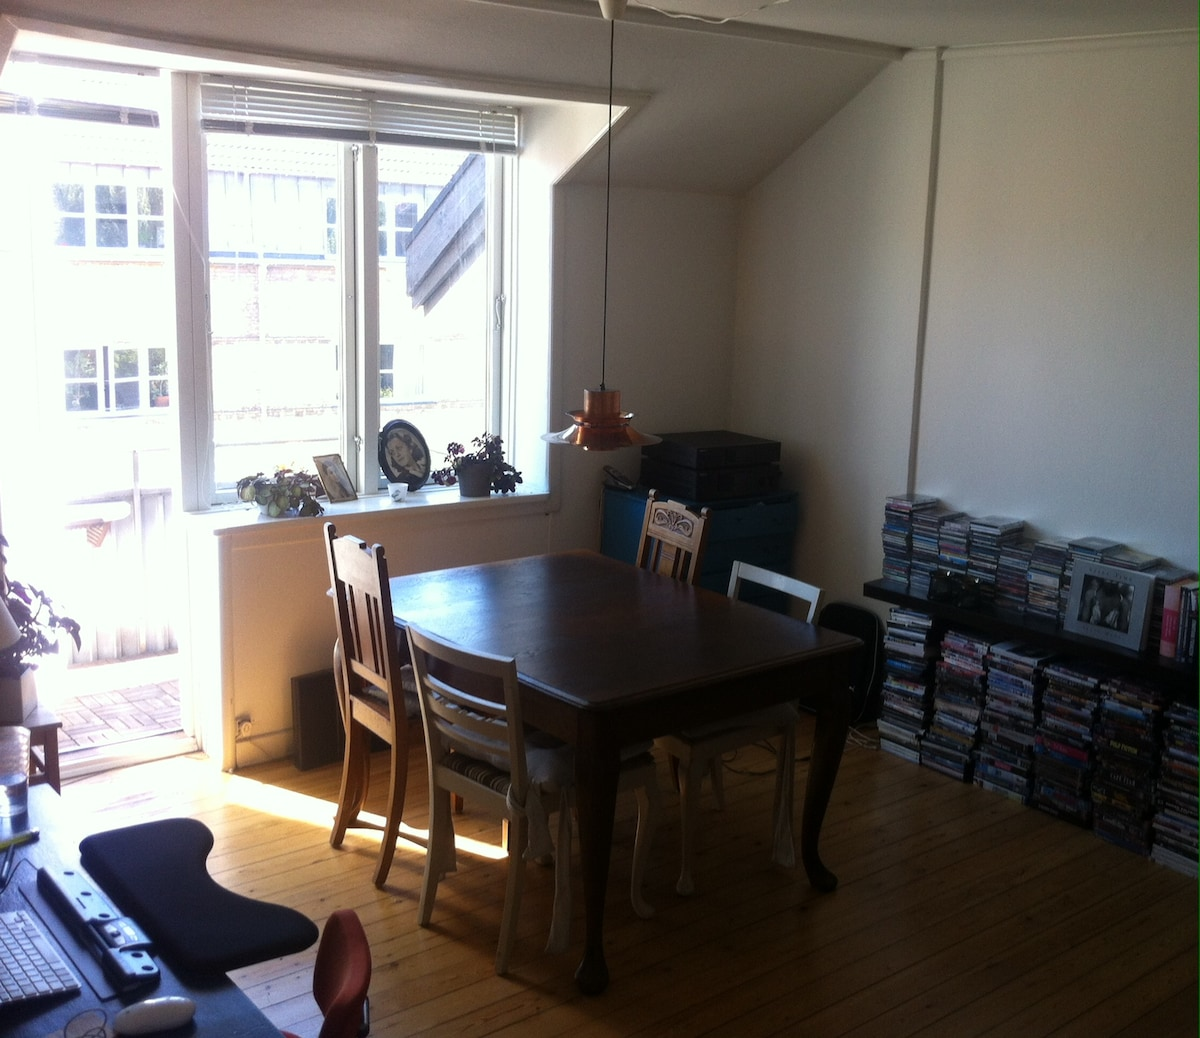 Lovely apartment with sunny balcony